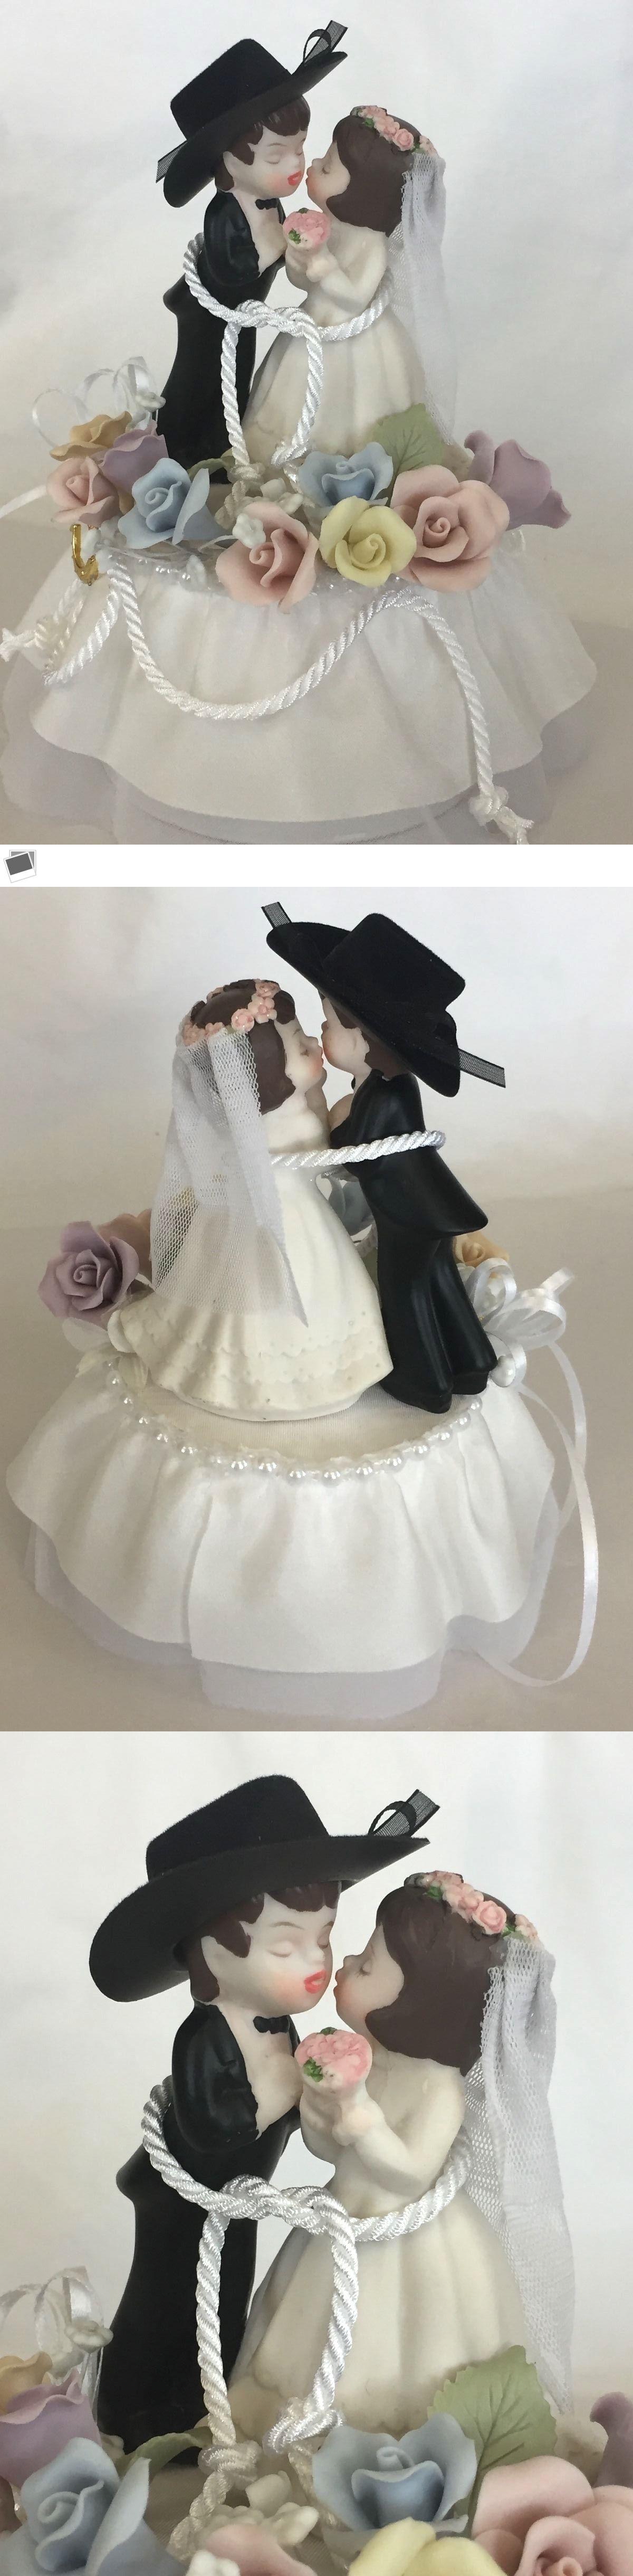 Fine Jack Sally Wedding Cake Toppers Adornment - The Wedding Ideas ...